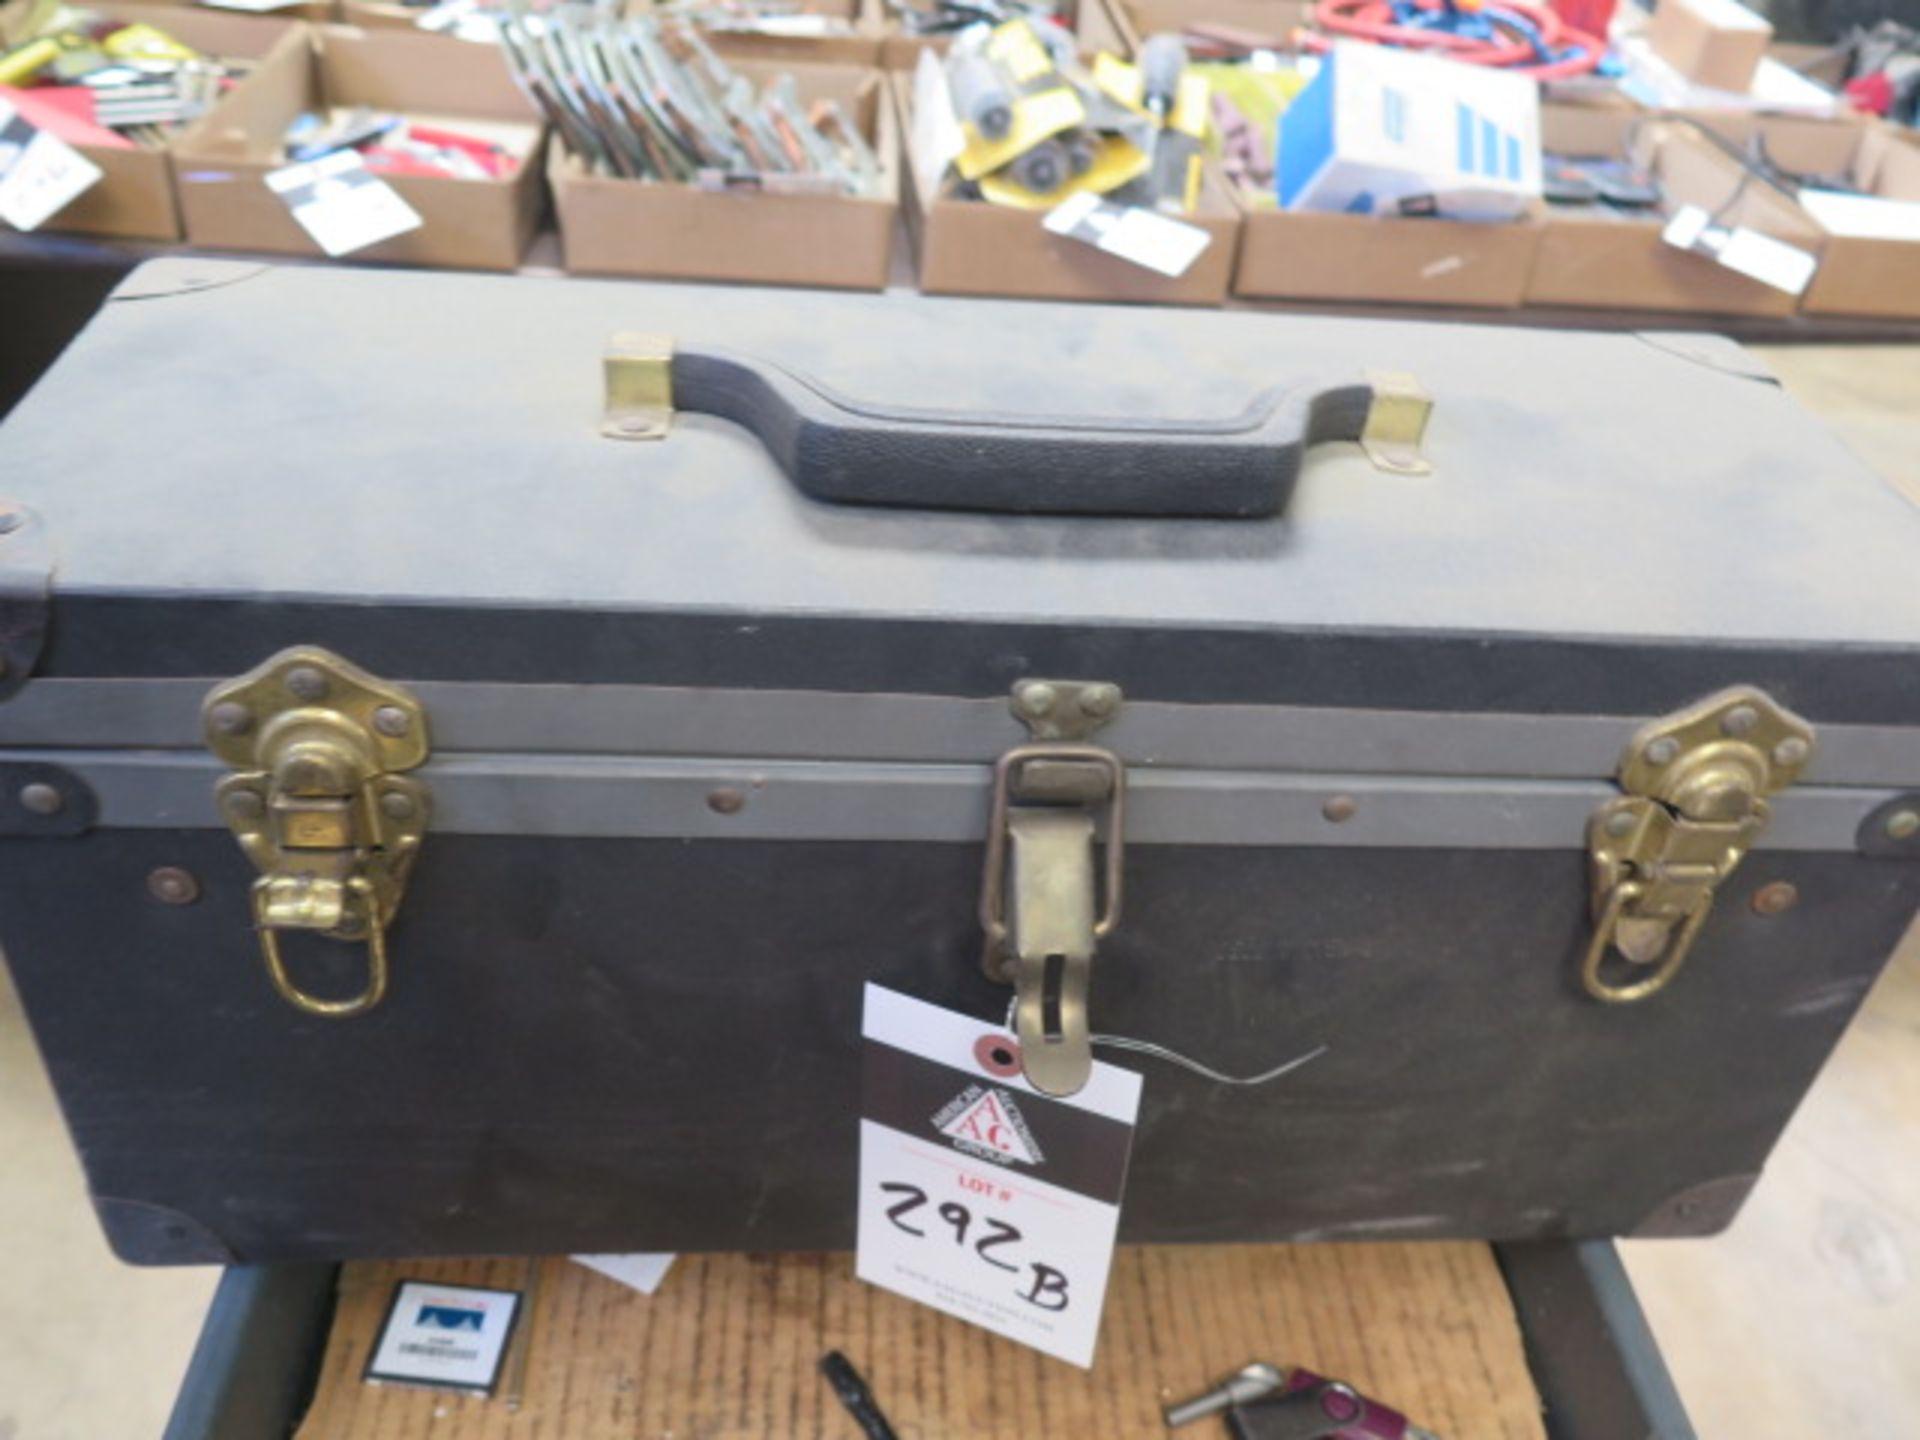 Craftsman Belt Sander (SOLD AS-IS - NO WARRANTY)